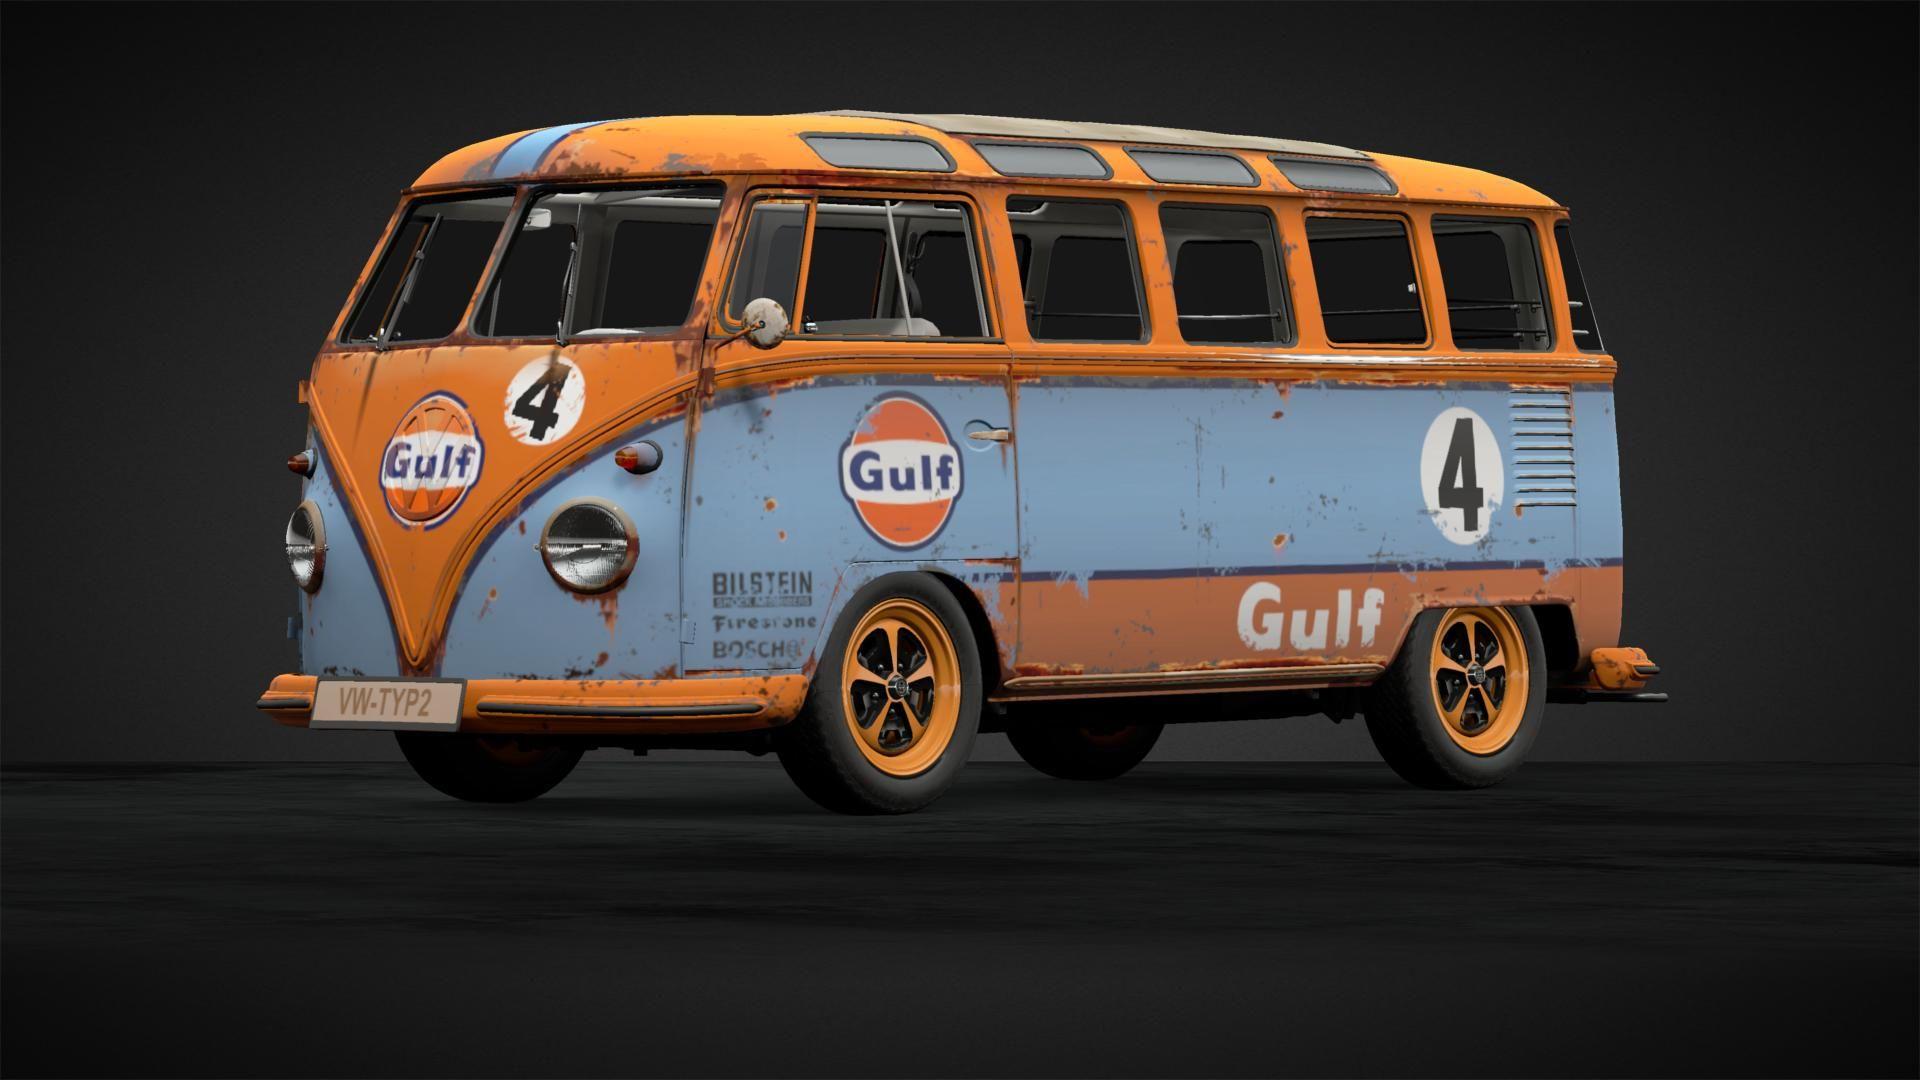 Rusty Samba Bus Gulf 2 Car Livery By Rinleosoul Community